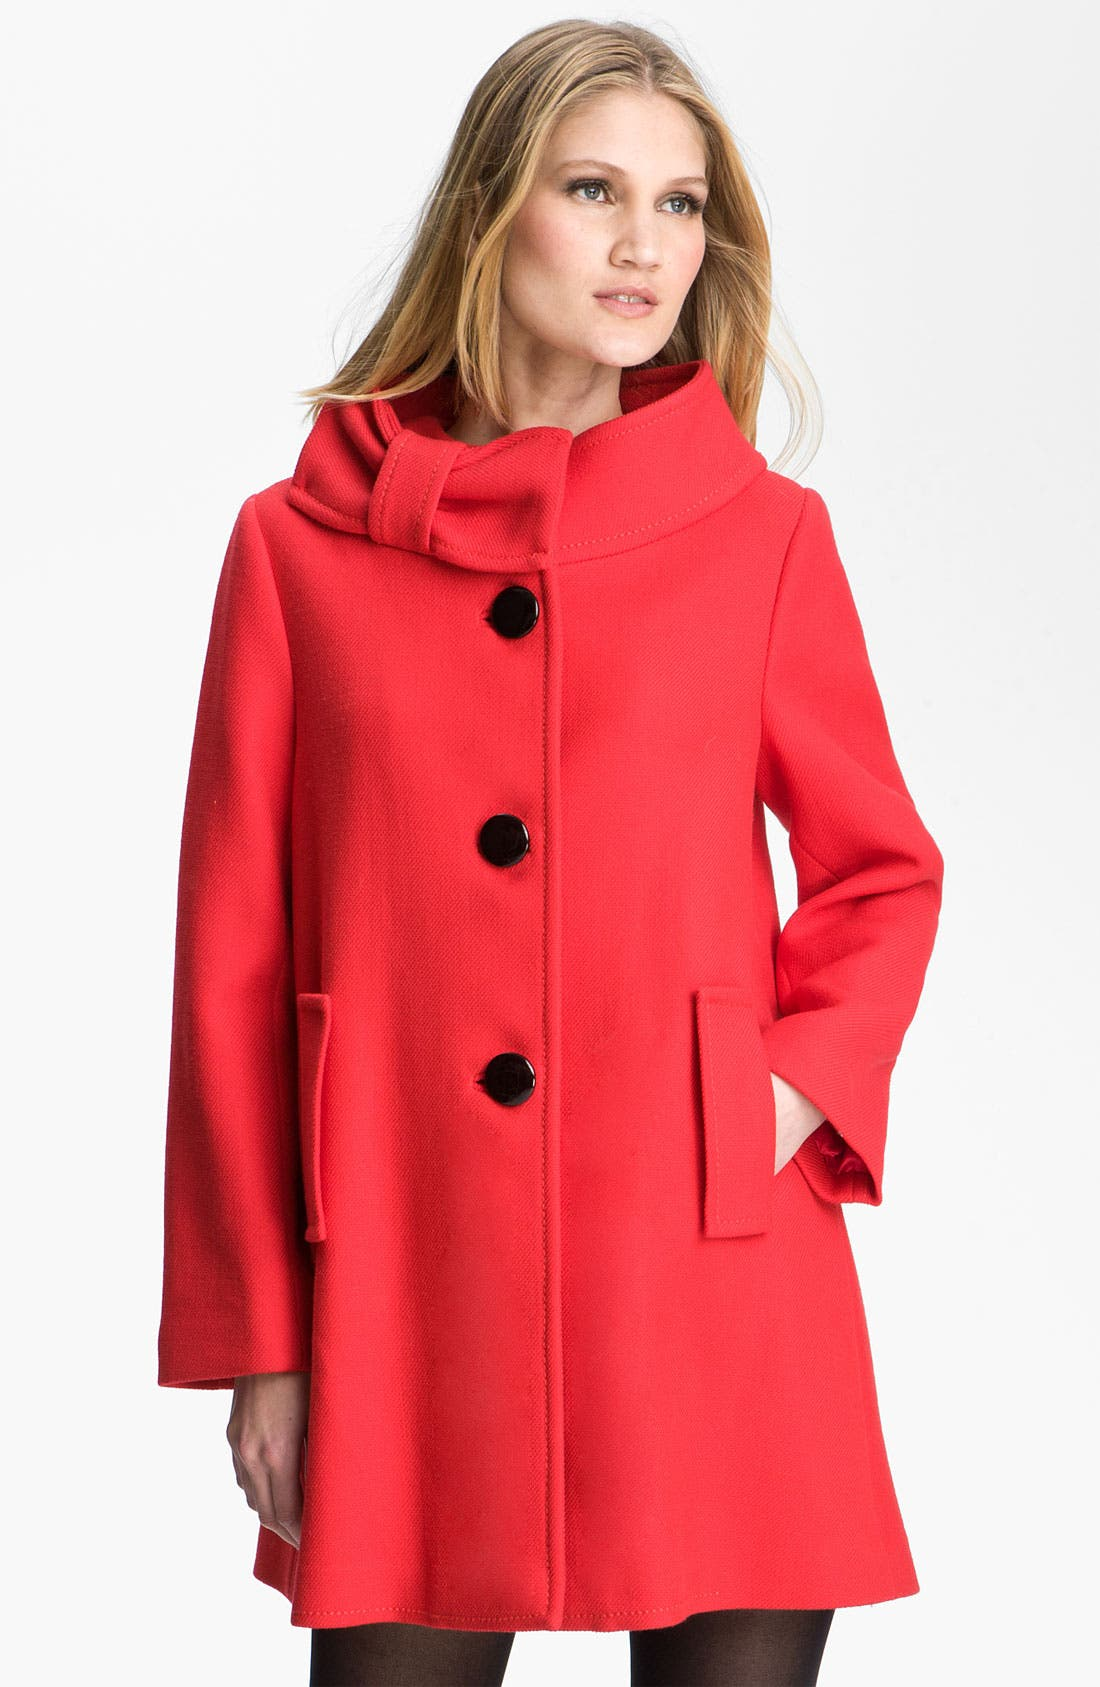 Main Image - kate spade new york 'suzette' coat